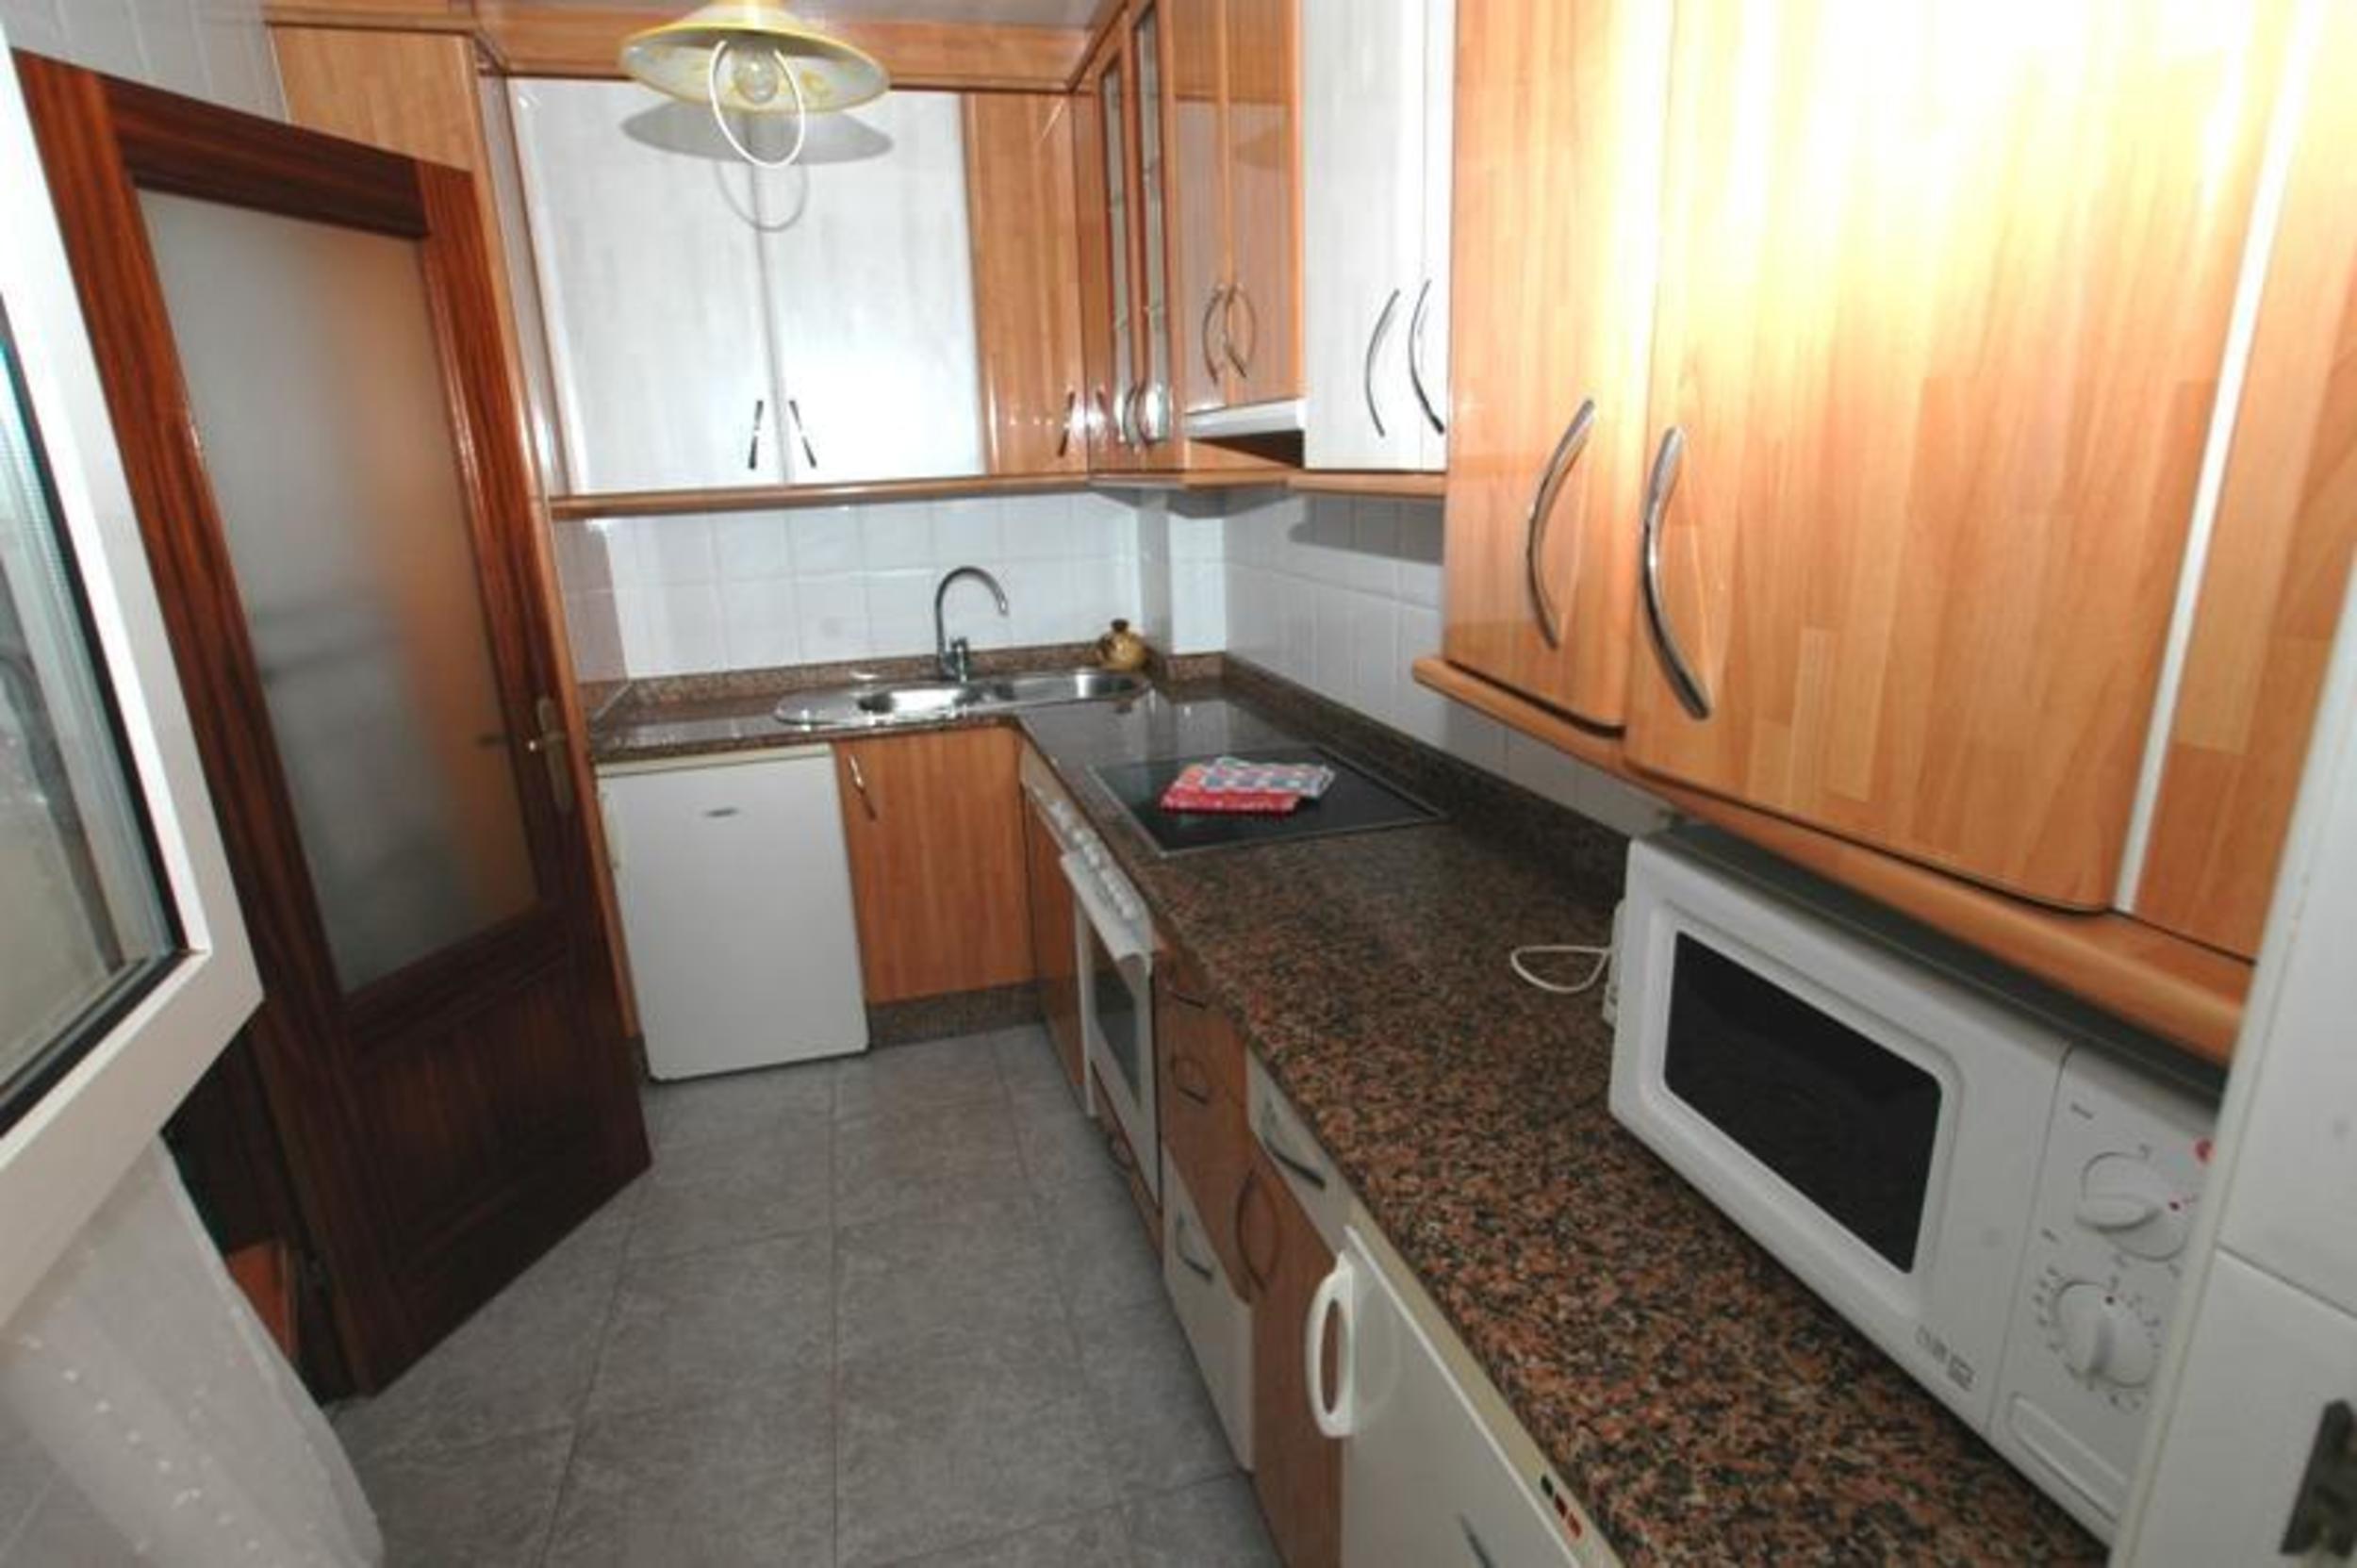 Ferienwohnung Apartment - 2 Bedrooms with Pool and Sea views - 102766 (2360874), Isla, Costa de Cantabria, Kantabrien, Spanien, Bild 3